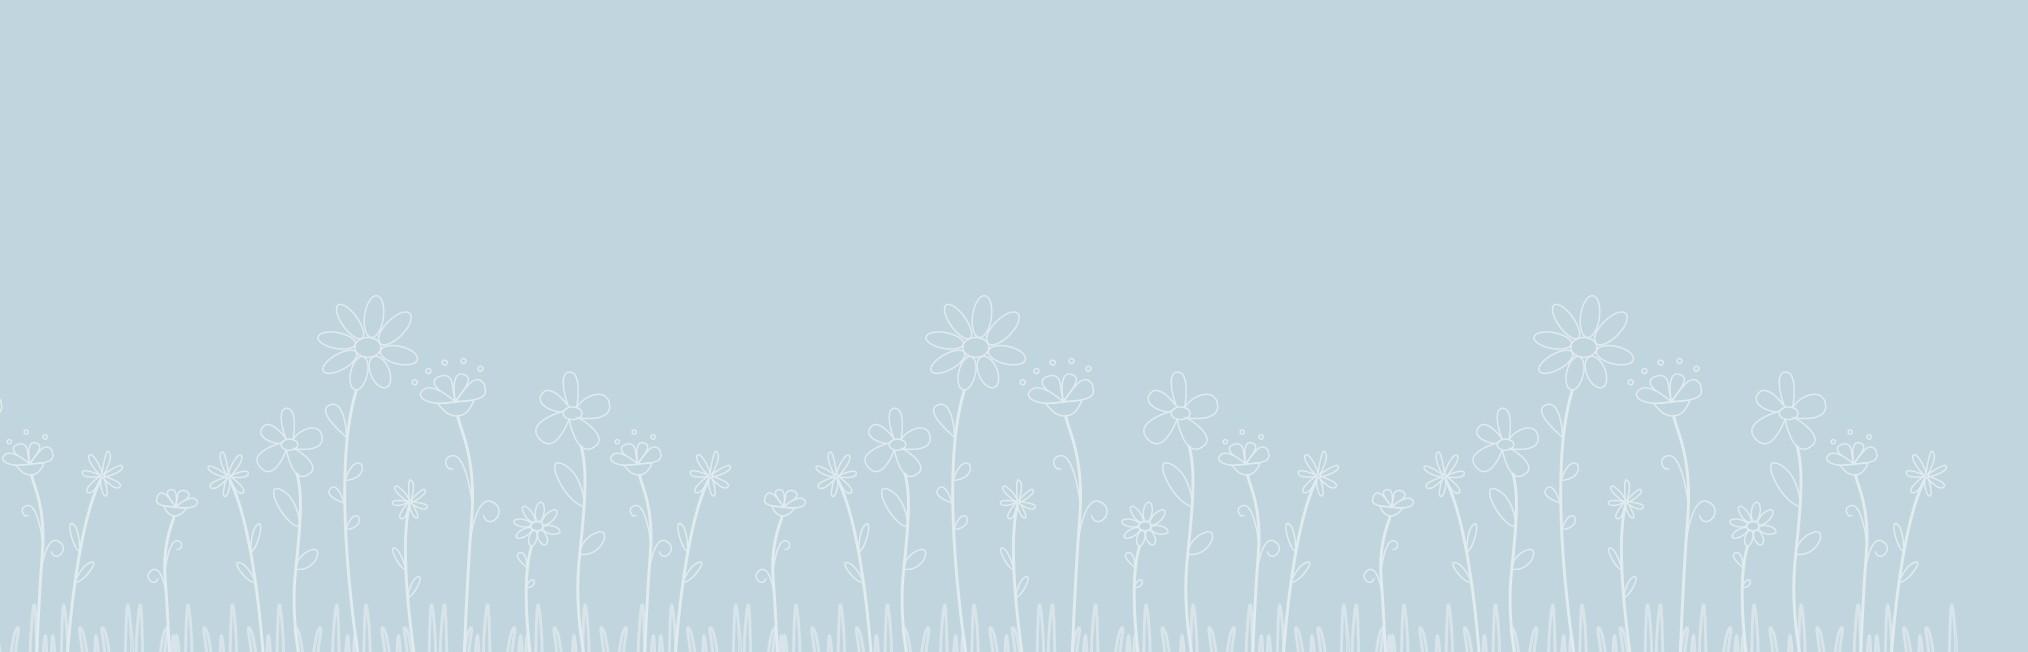 Catnapweb web design and SEO - blue background